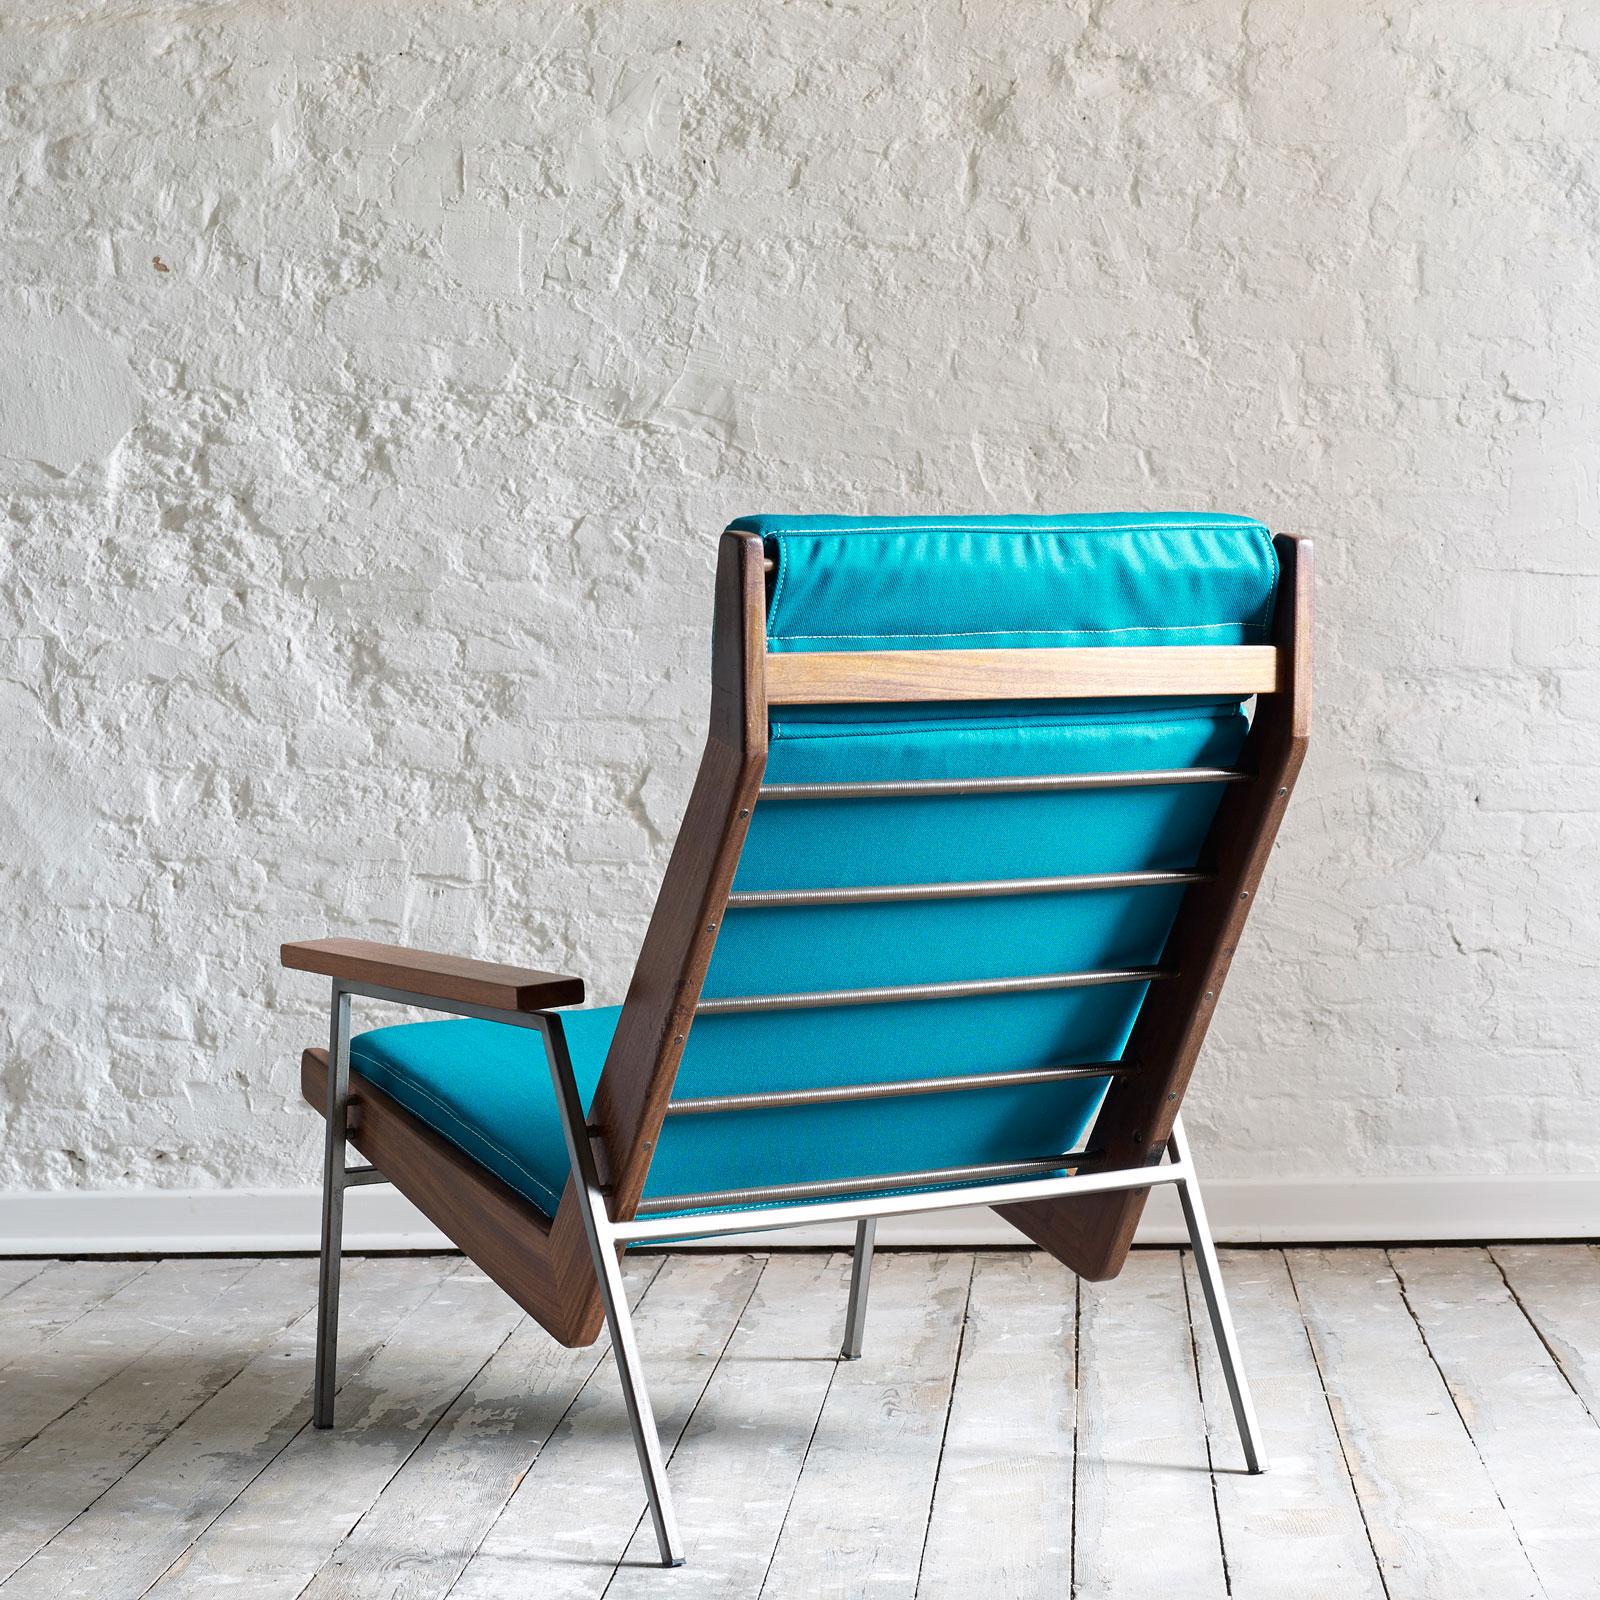 teal lounge chair best deer blind chairs quotlotus quot la caravane studio